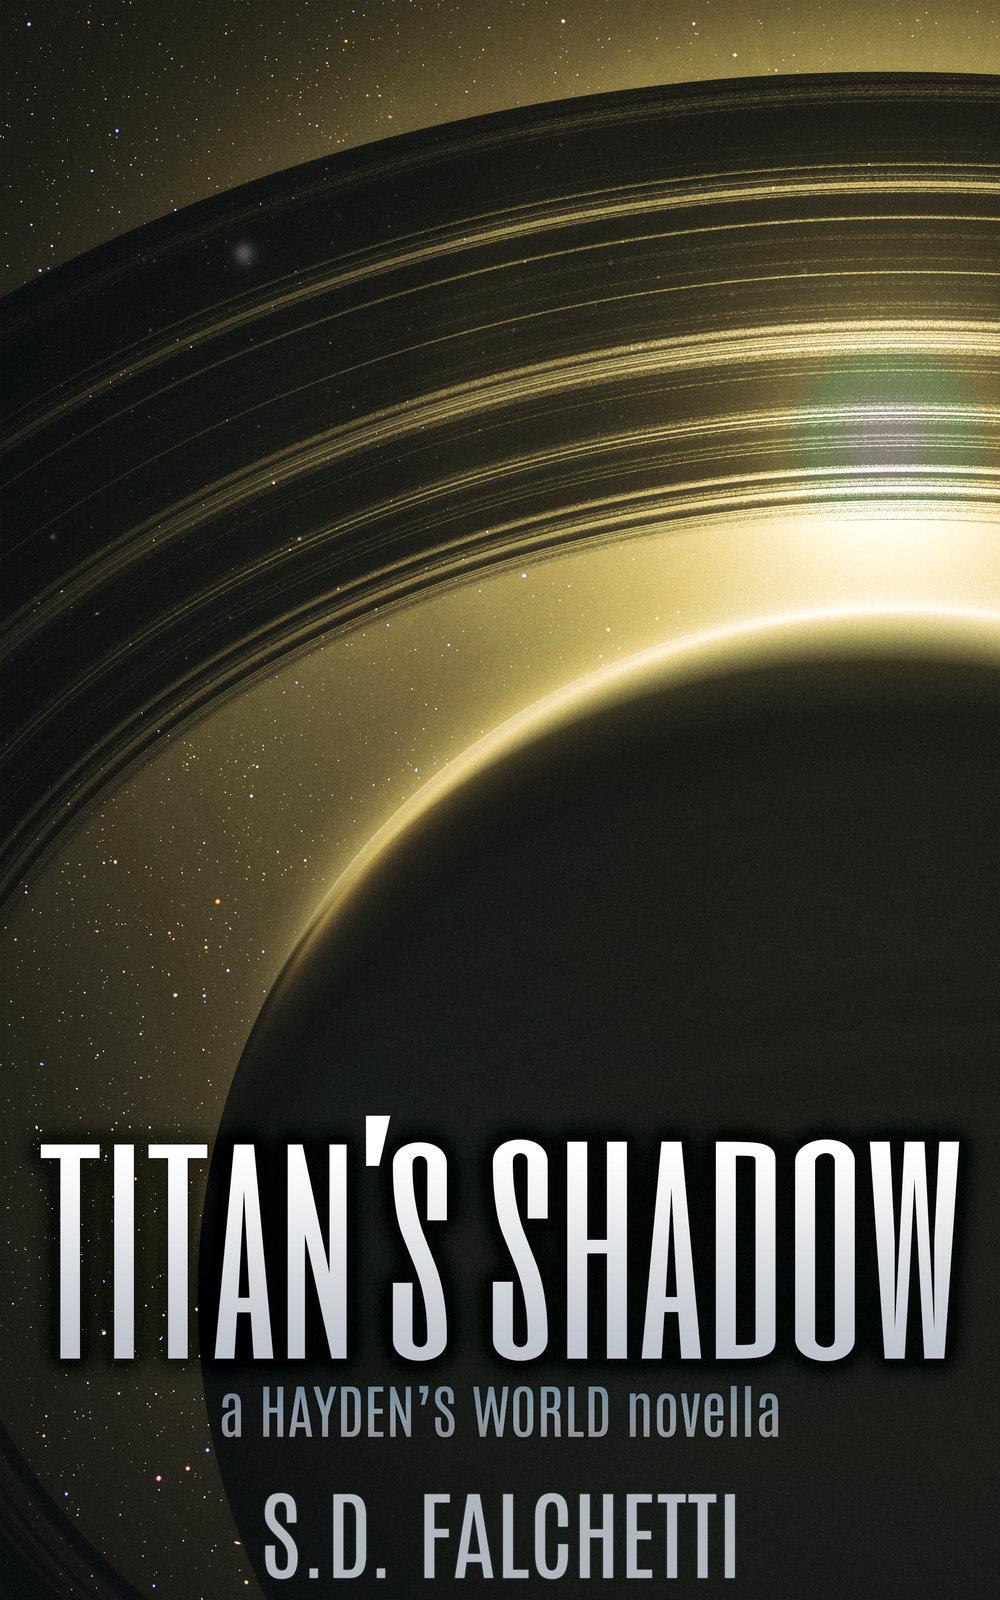 Titans Shadow.jpg